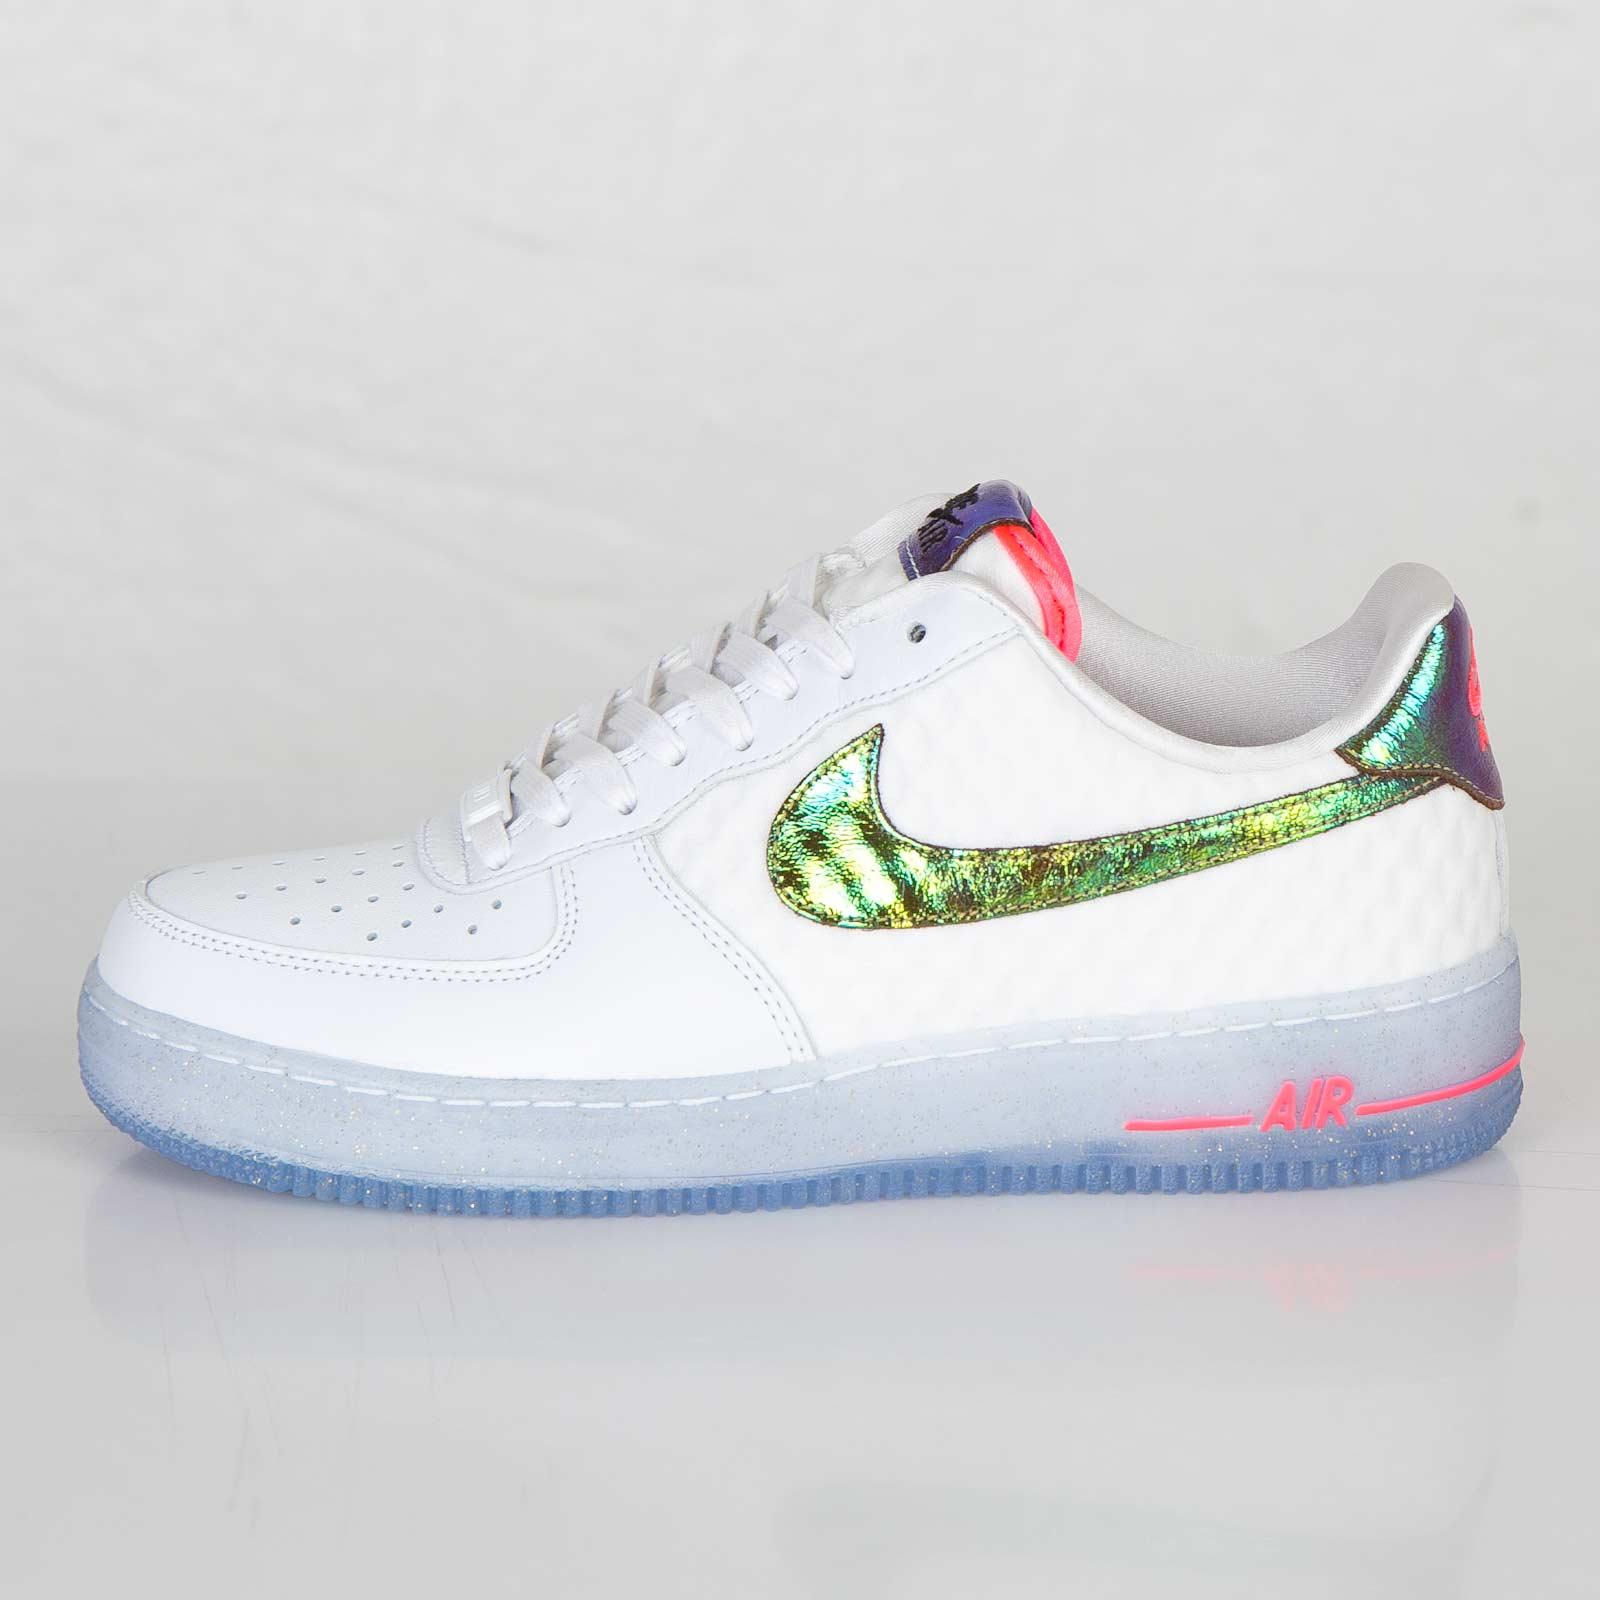 Nike Air Force 1 Low CMFT QS Crescent City | www